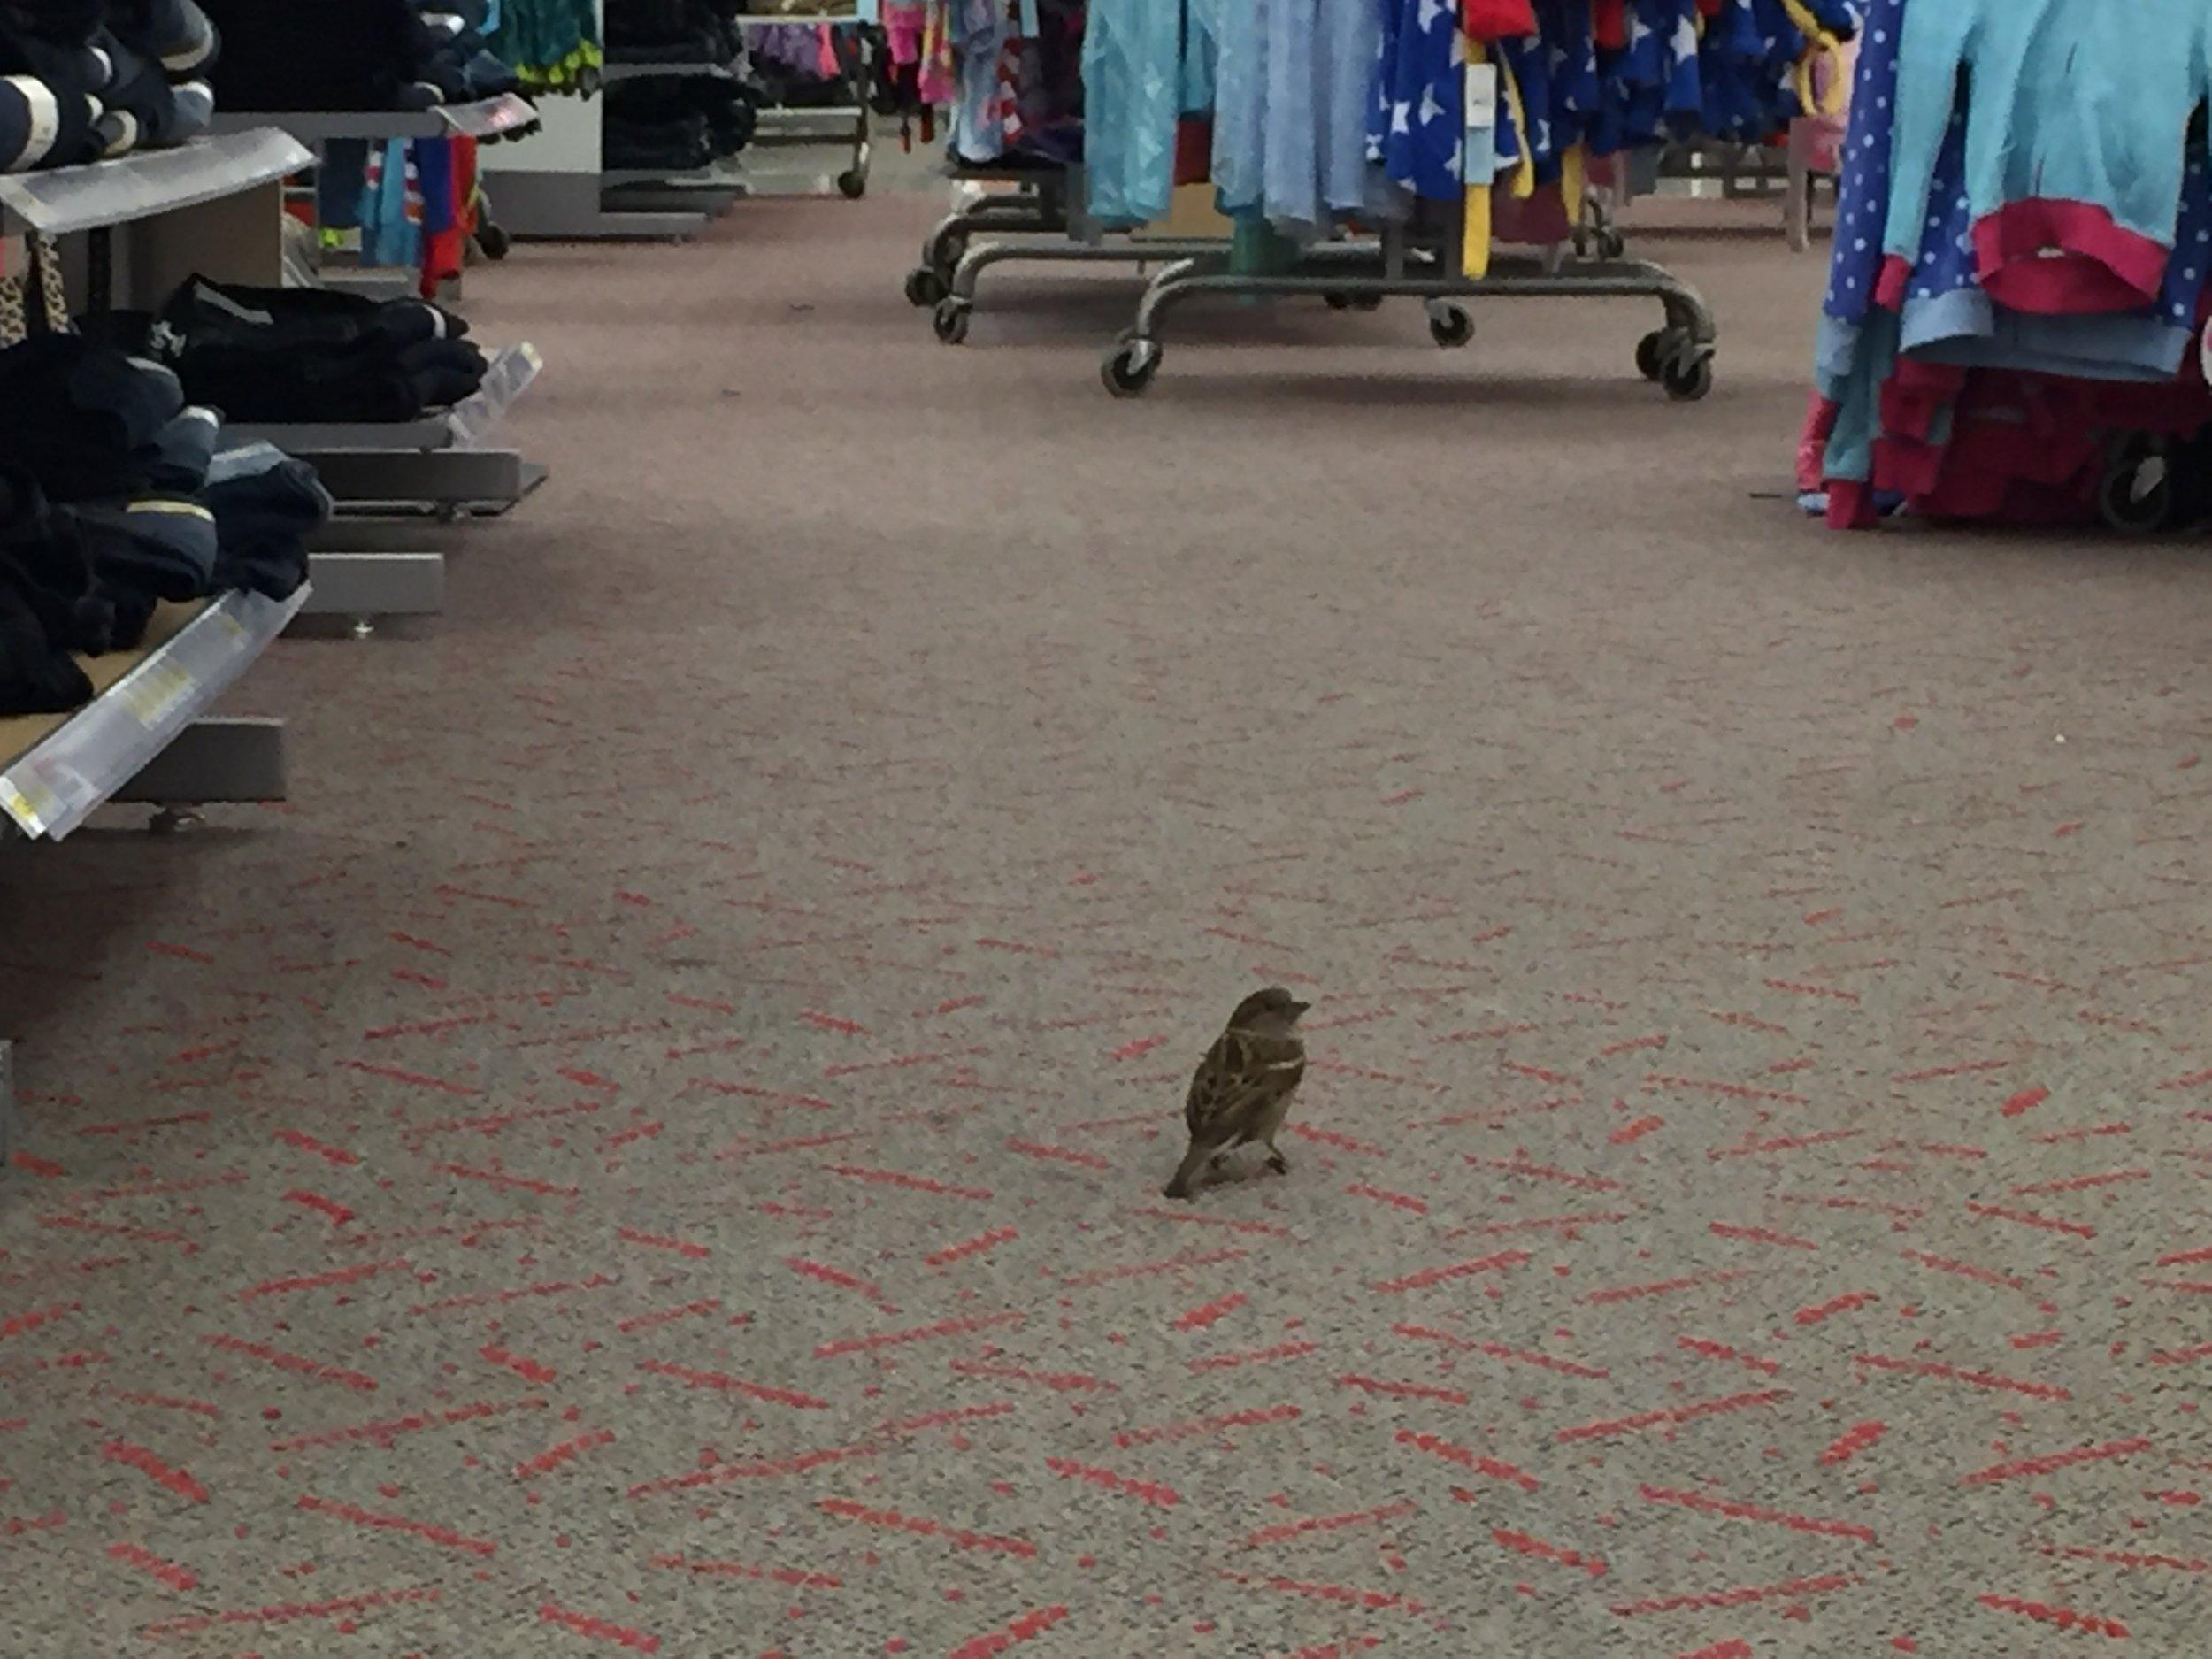 Even when I'm not birding... I'm birding! Check out my Target eBird  checklist